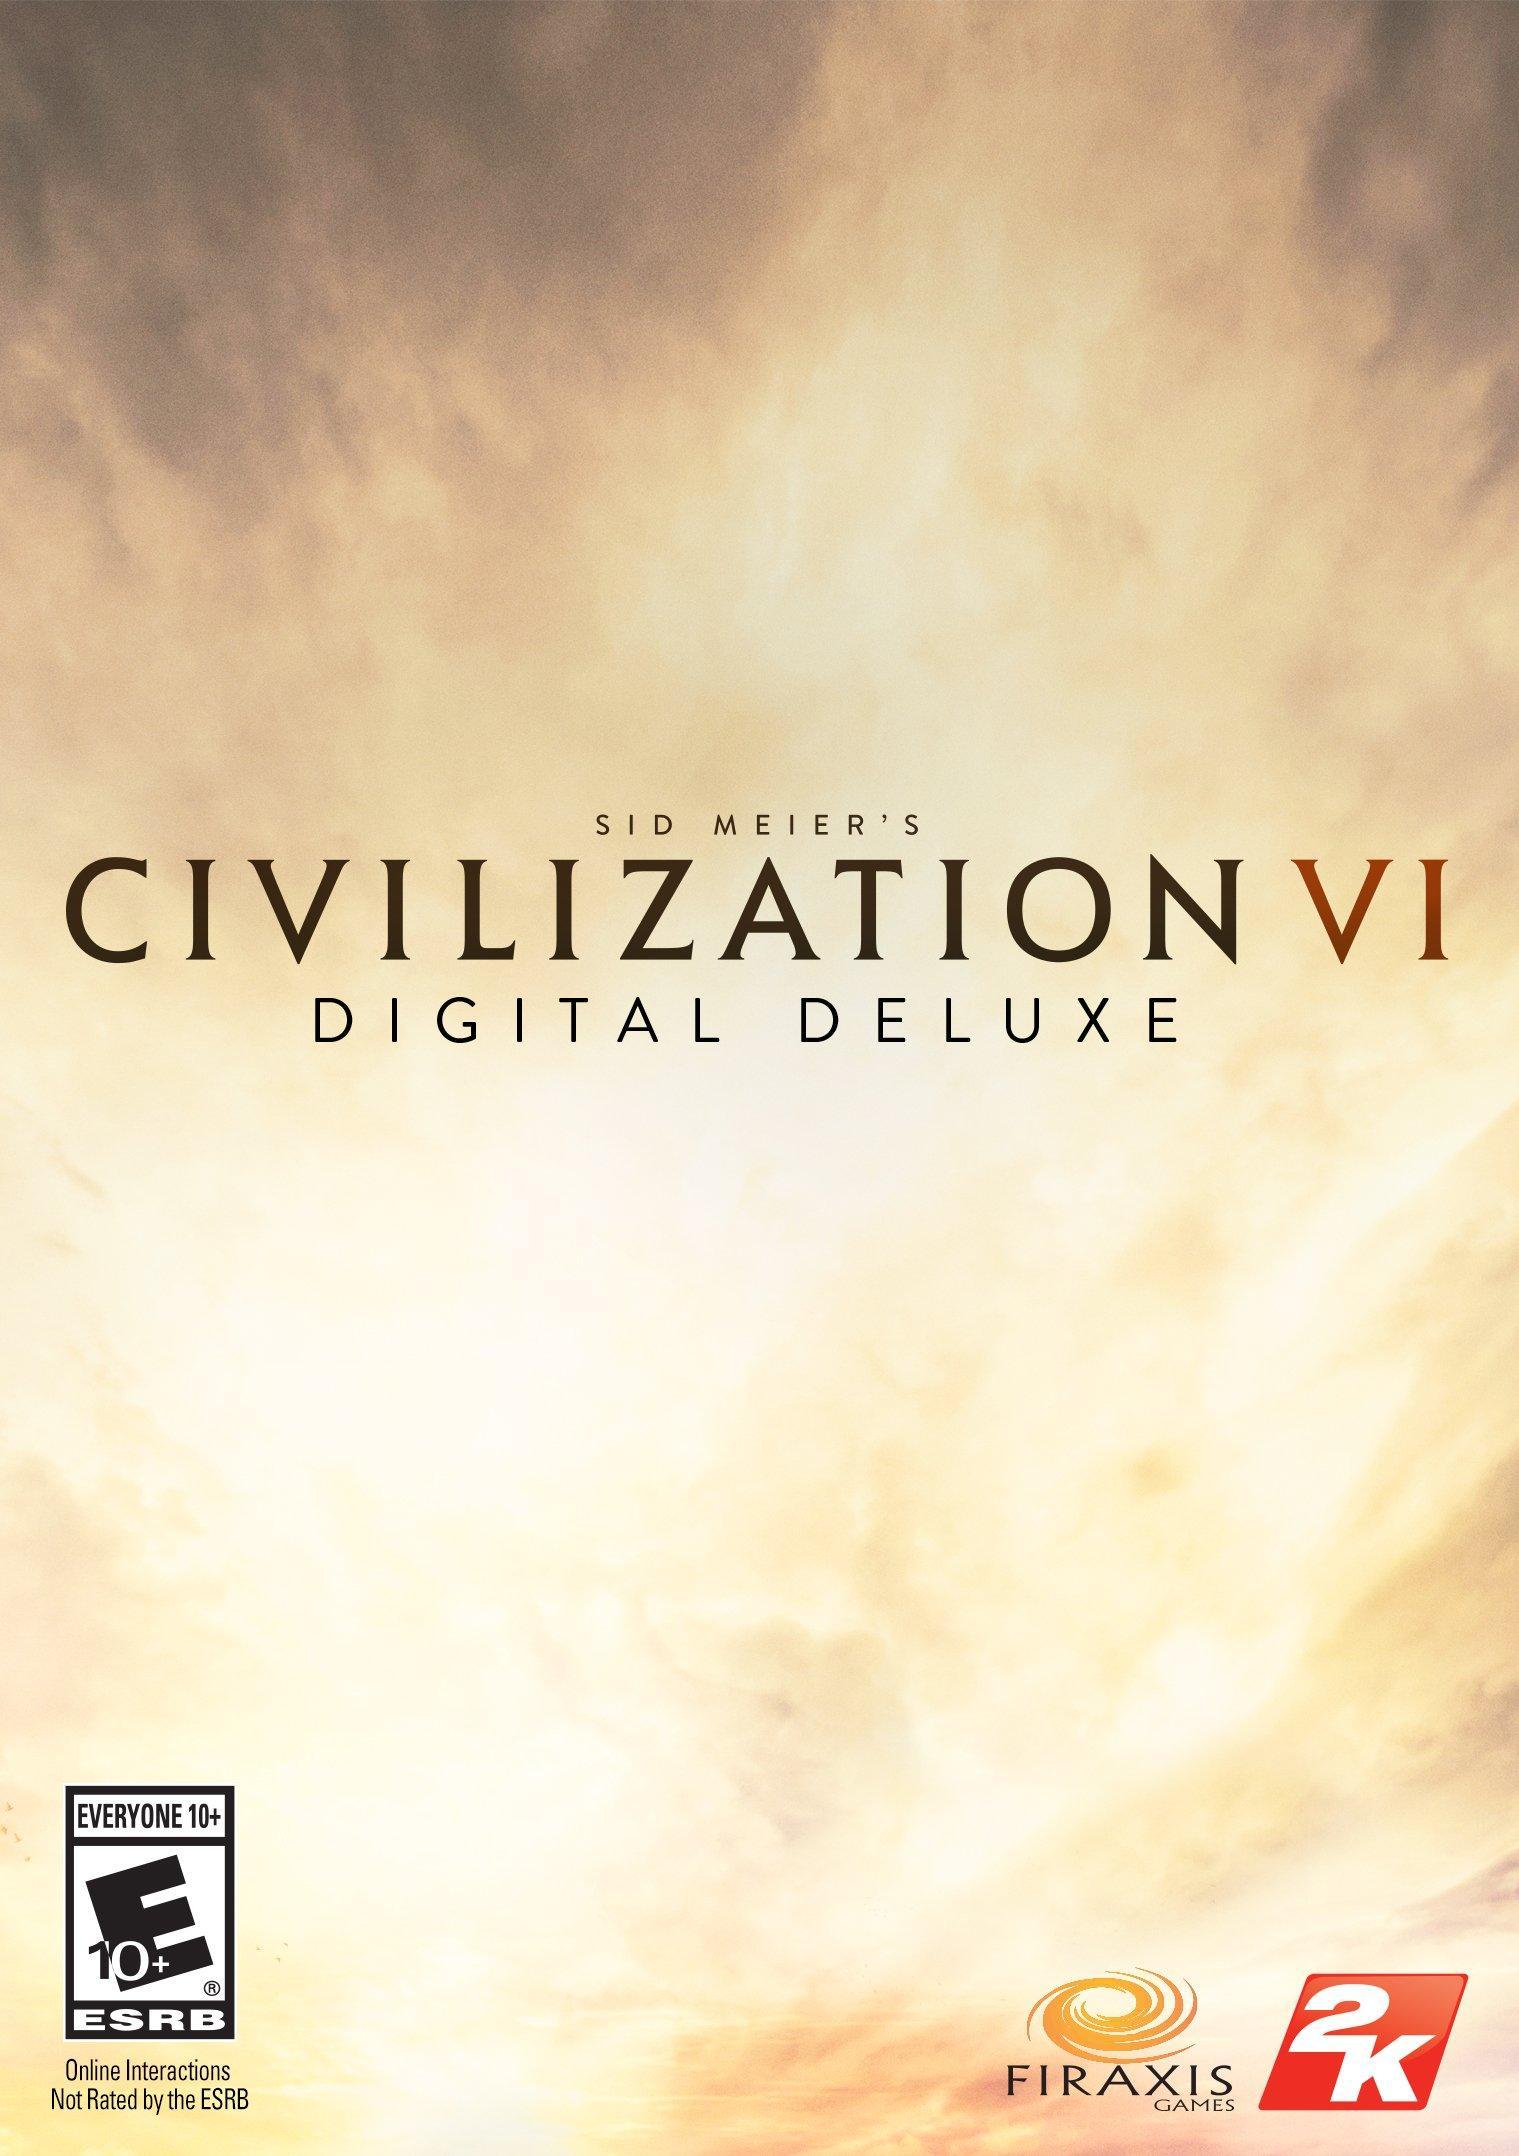 Sid Meier's Civilization VI Digital Deluxe Edition (PC - Digital) $19.99